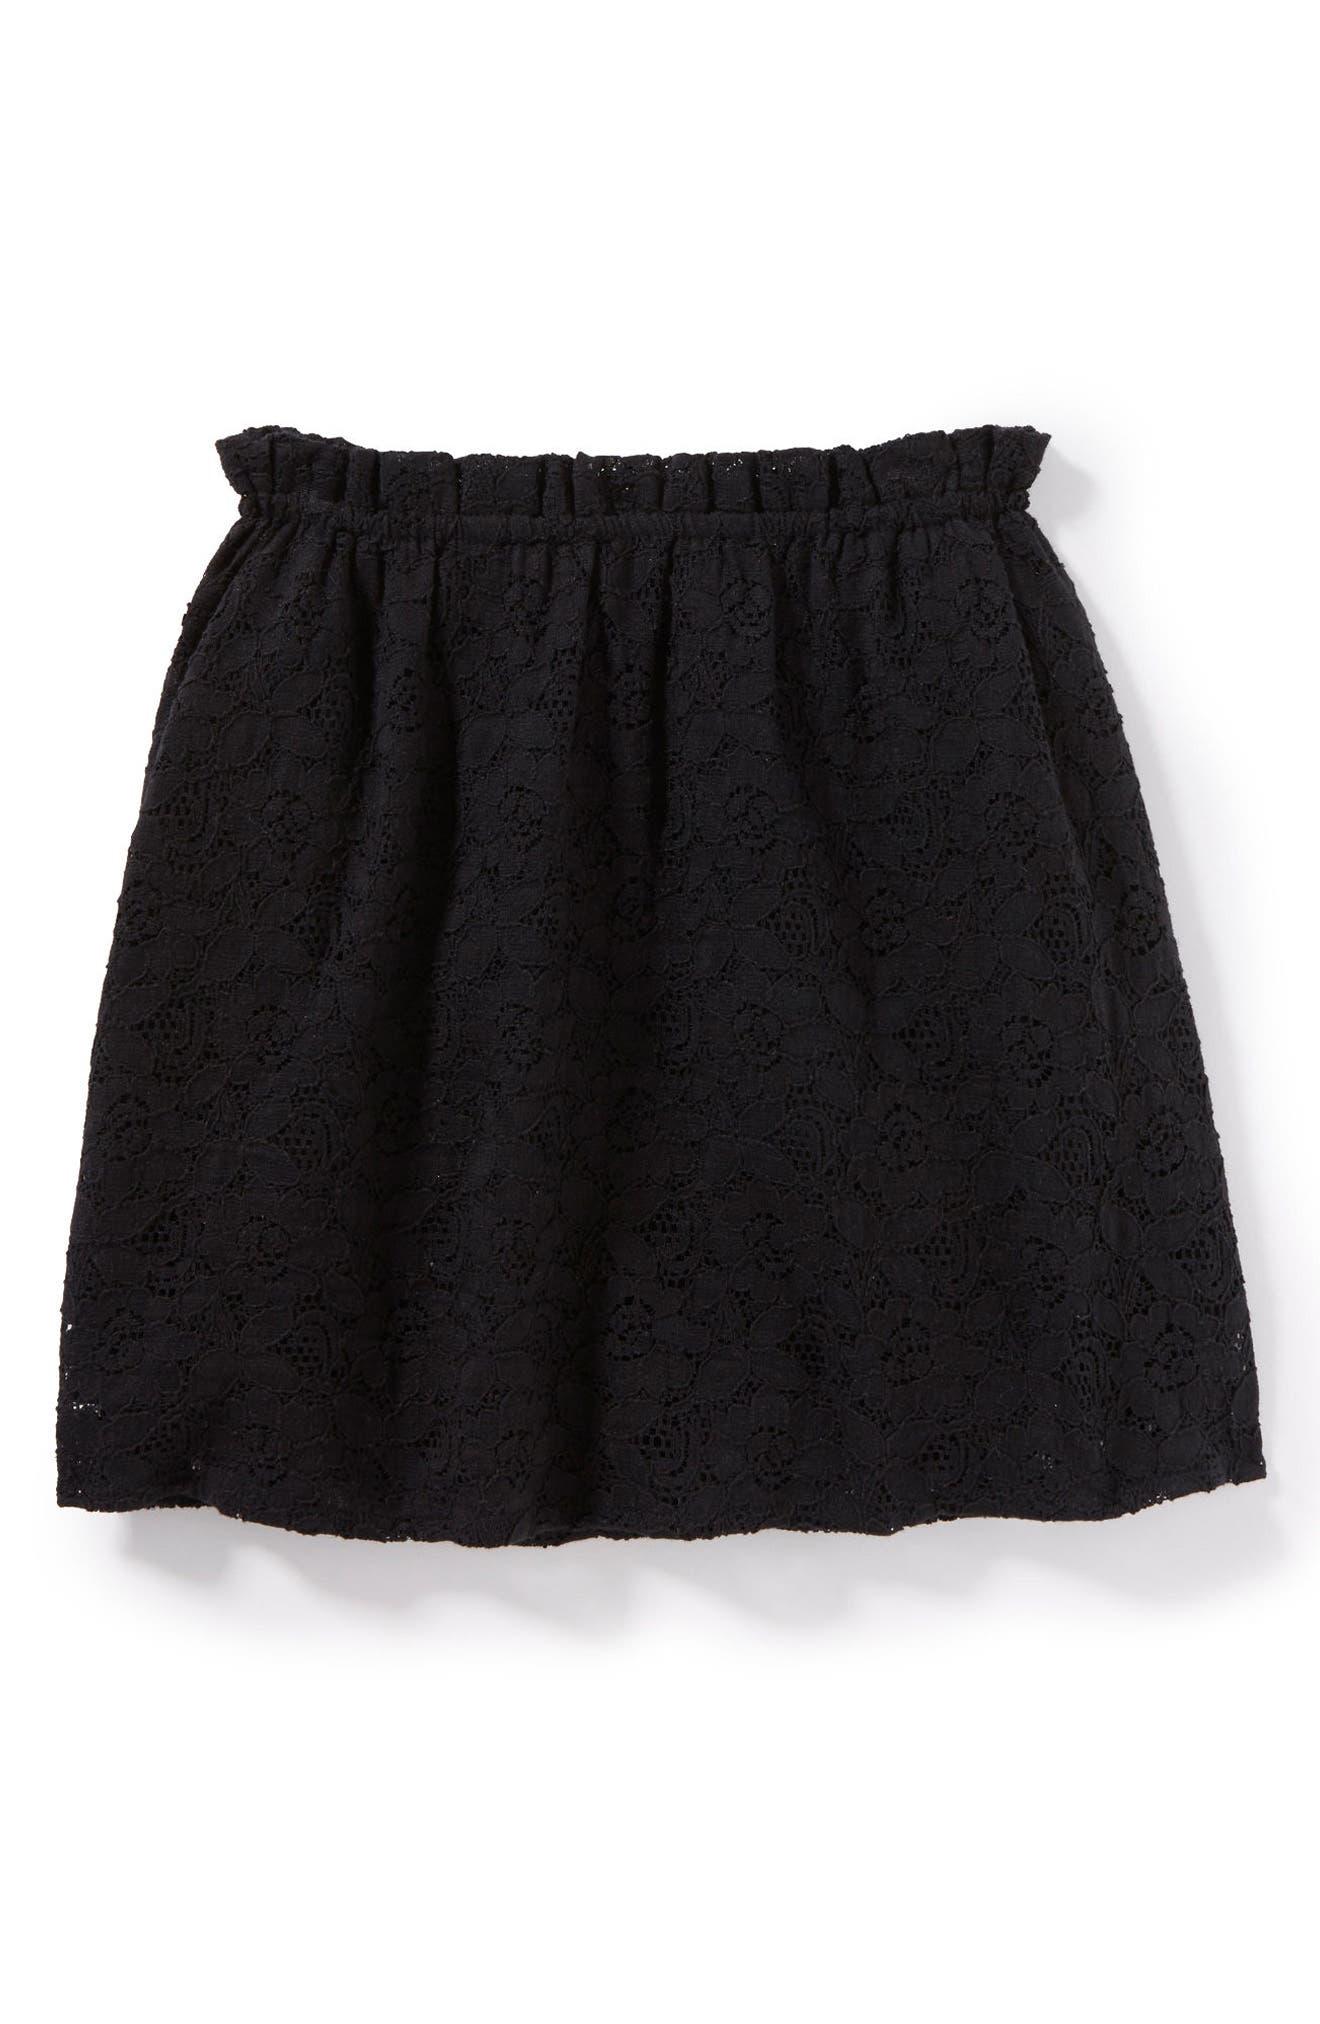 Renee Lace Skirt,                             Main thumbnail 1, color,                             001